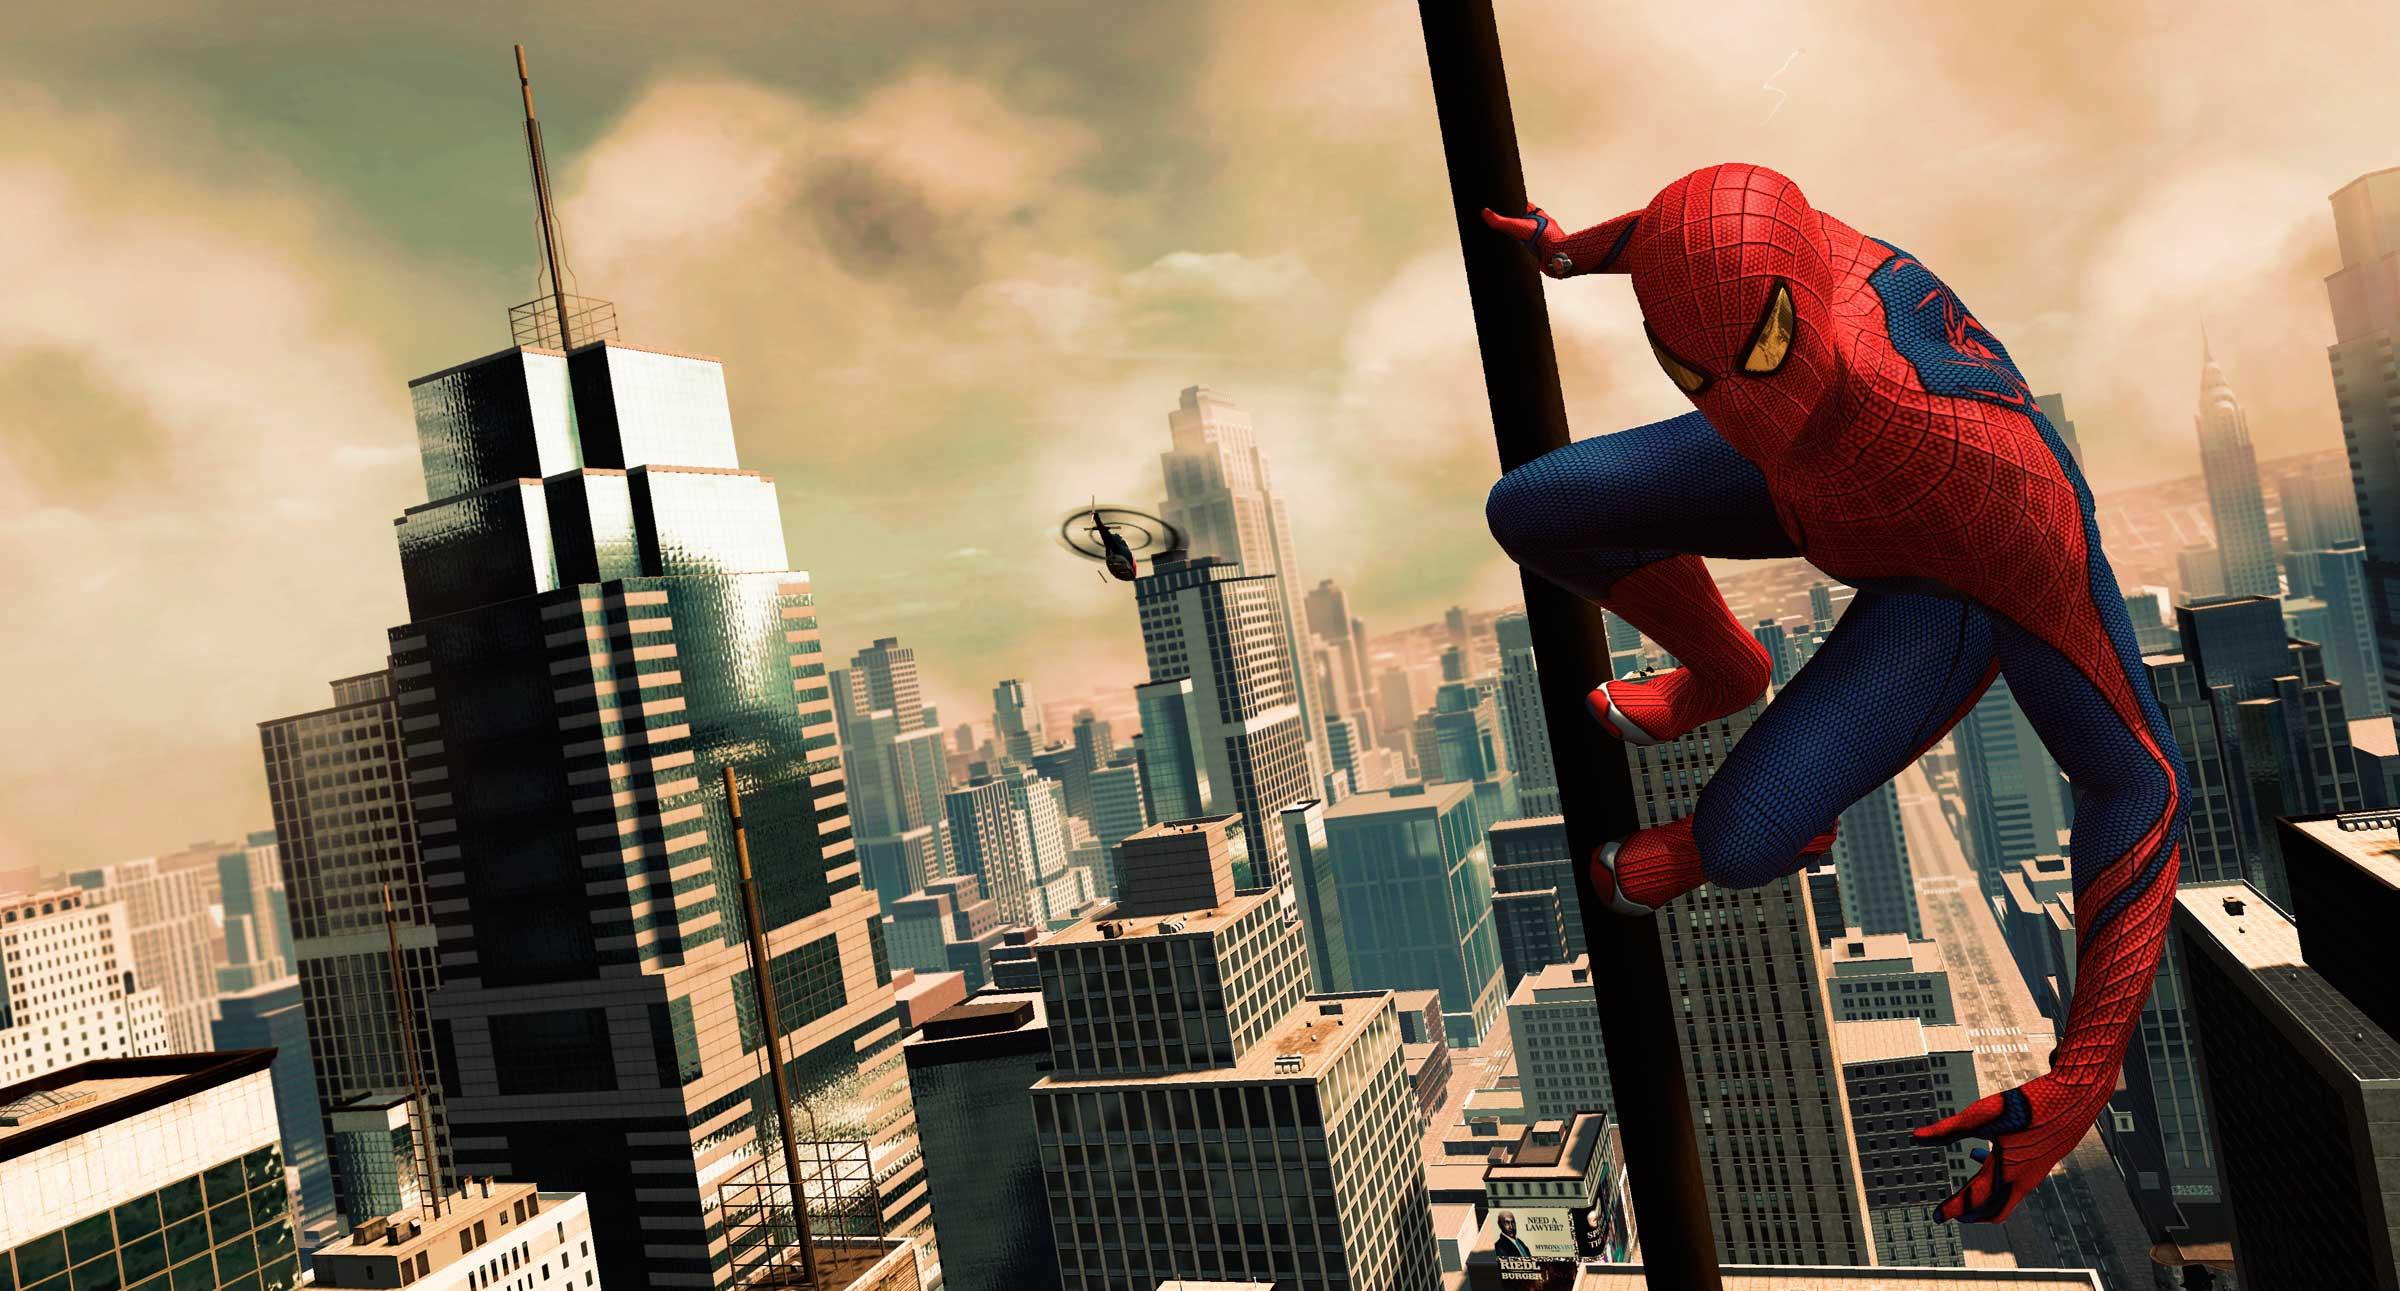 videojuegos The Amazing spider-man